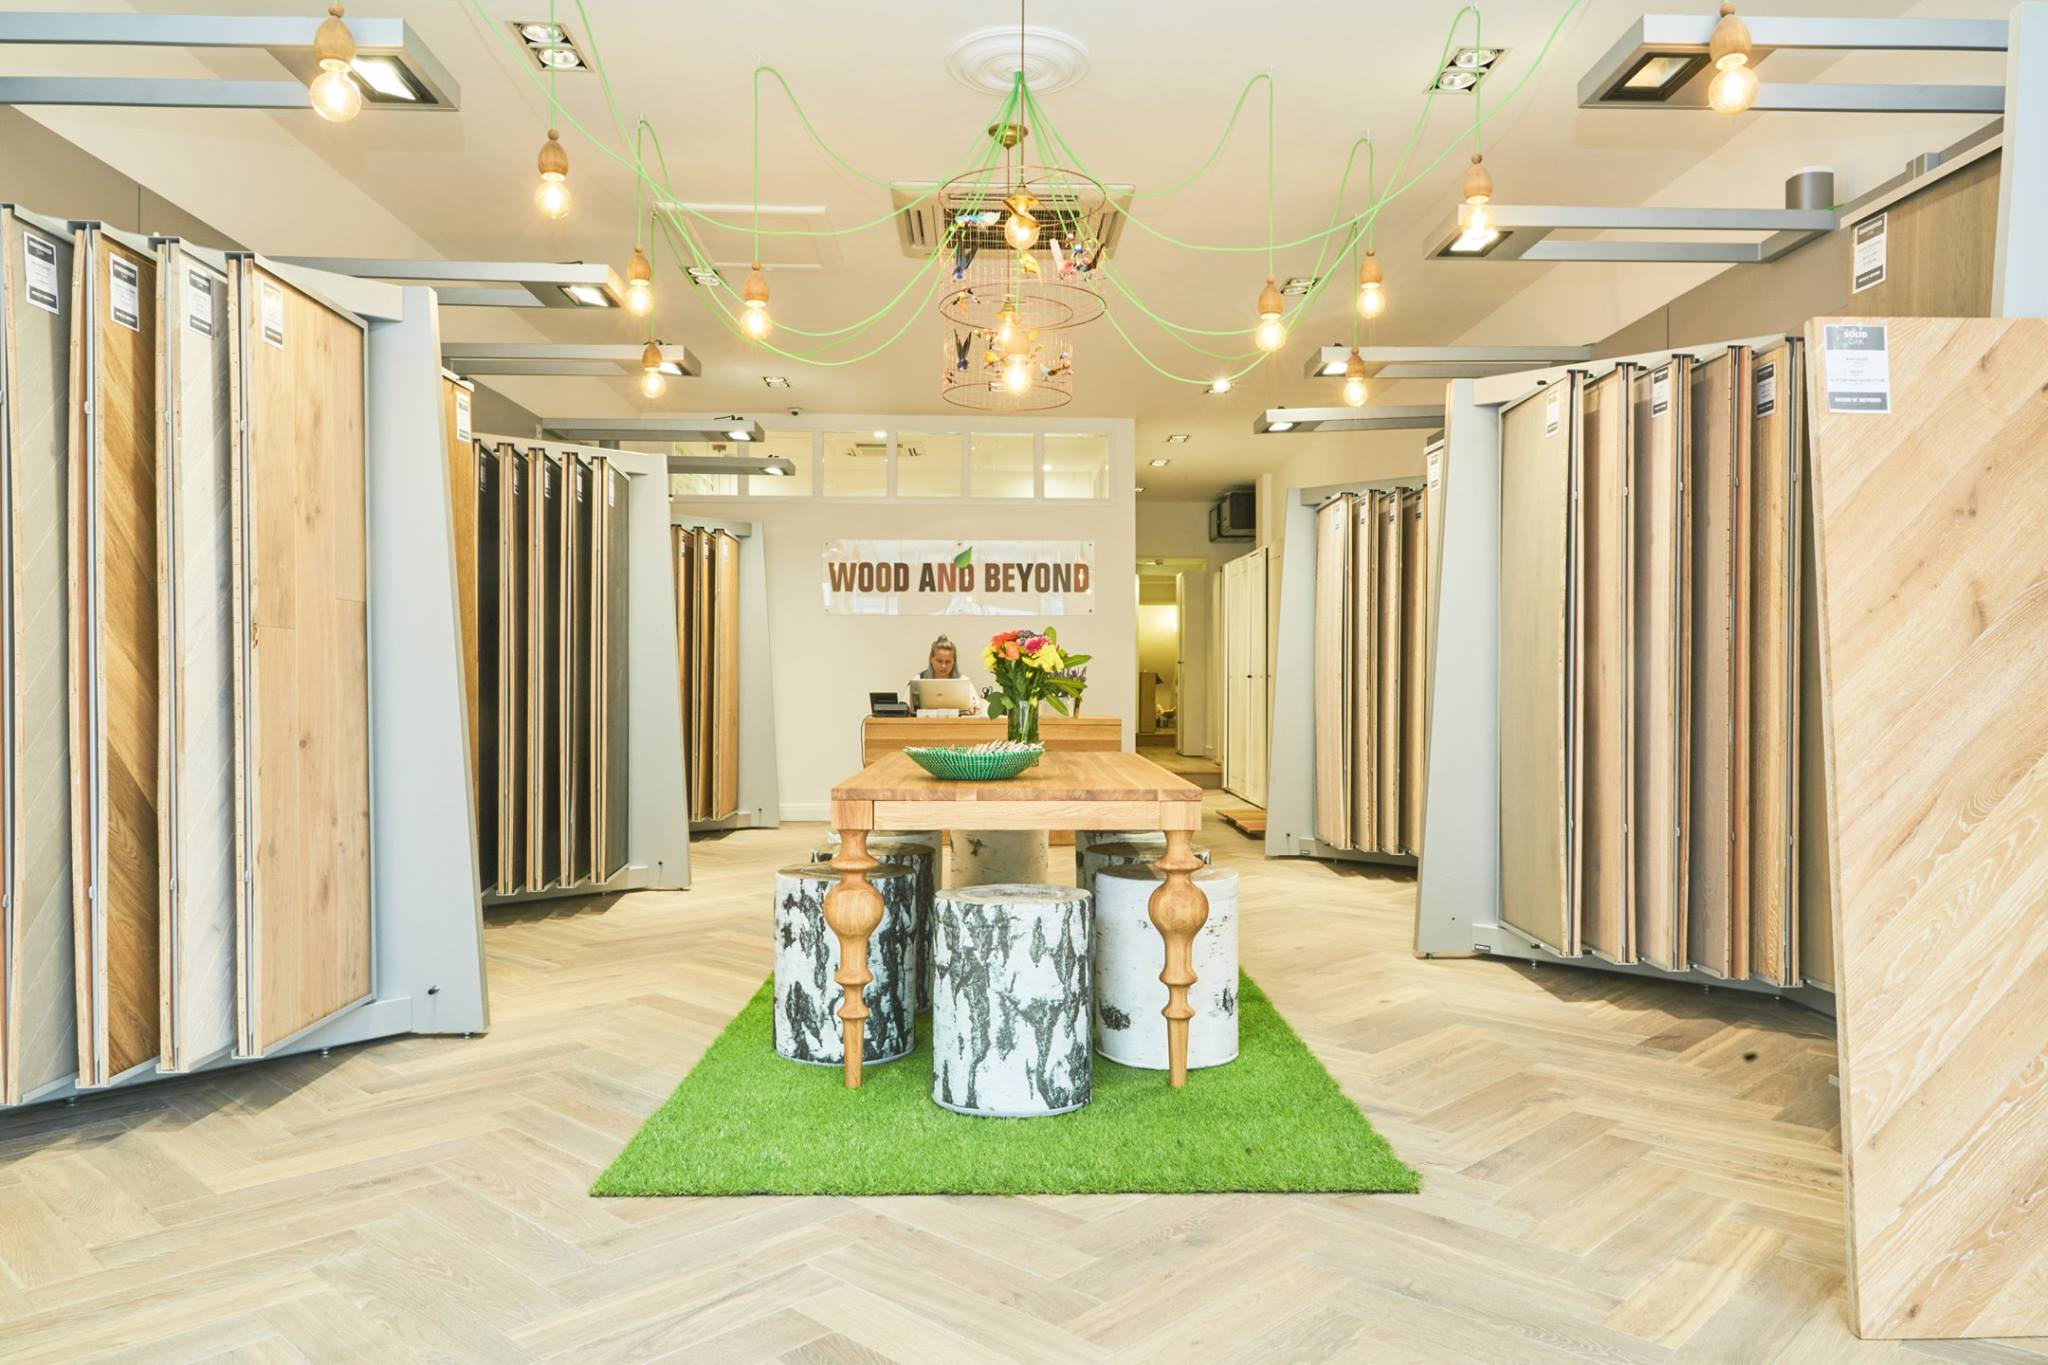 wood and beyond showroom